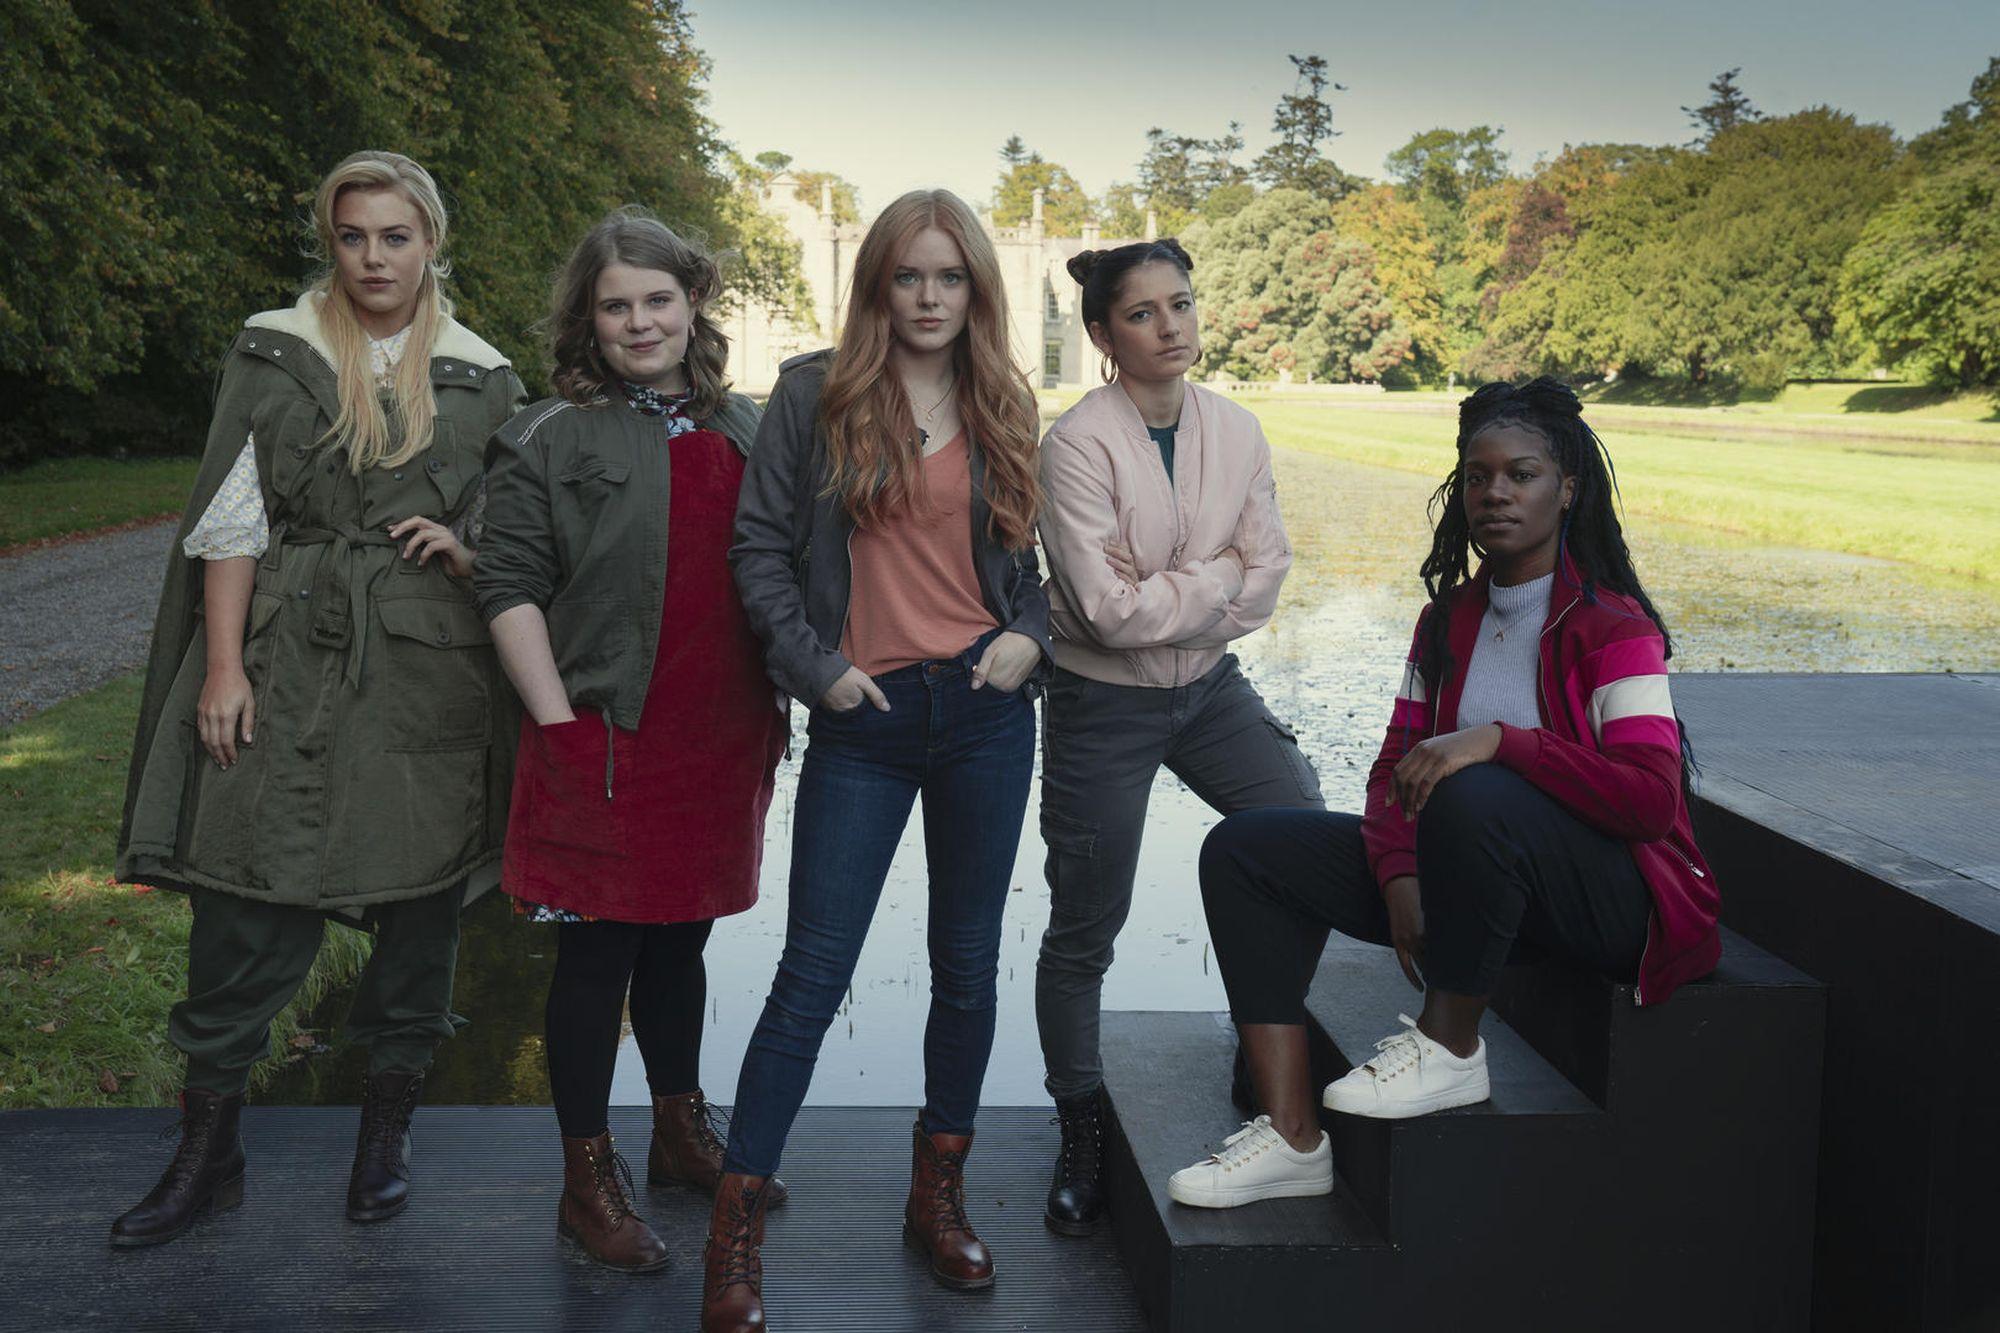 Catalogo Netflix Gennaio 2021: film e serie TV